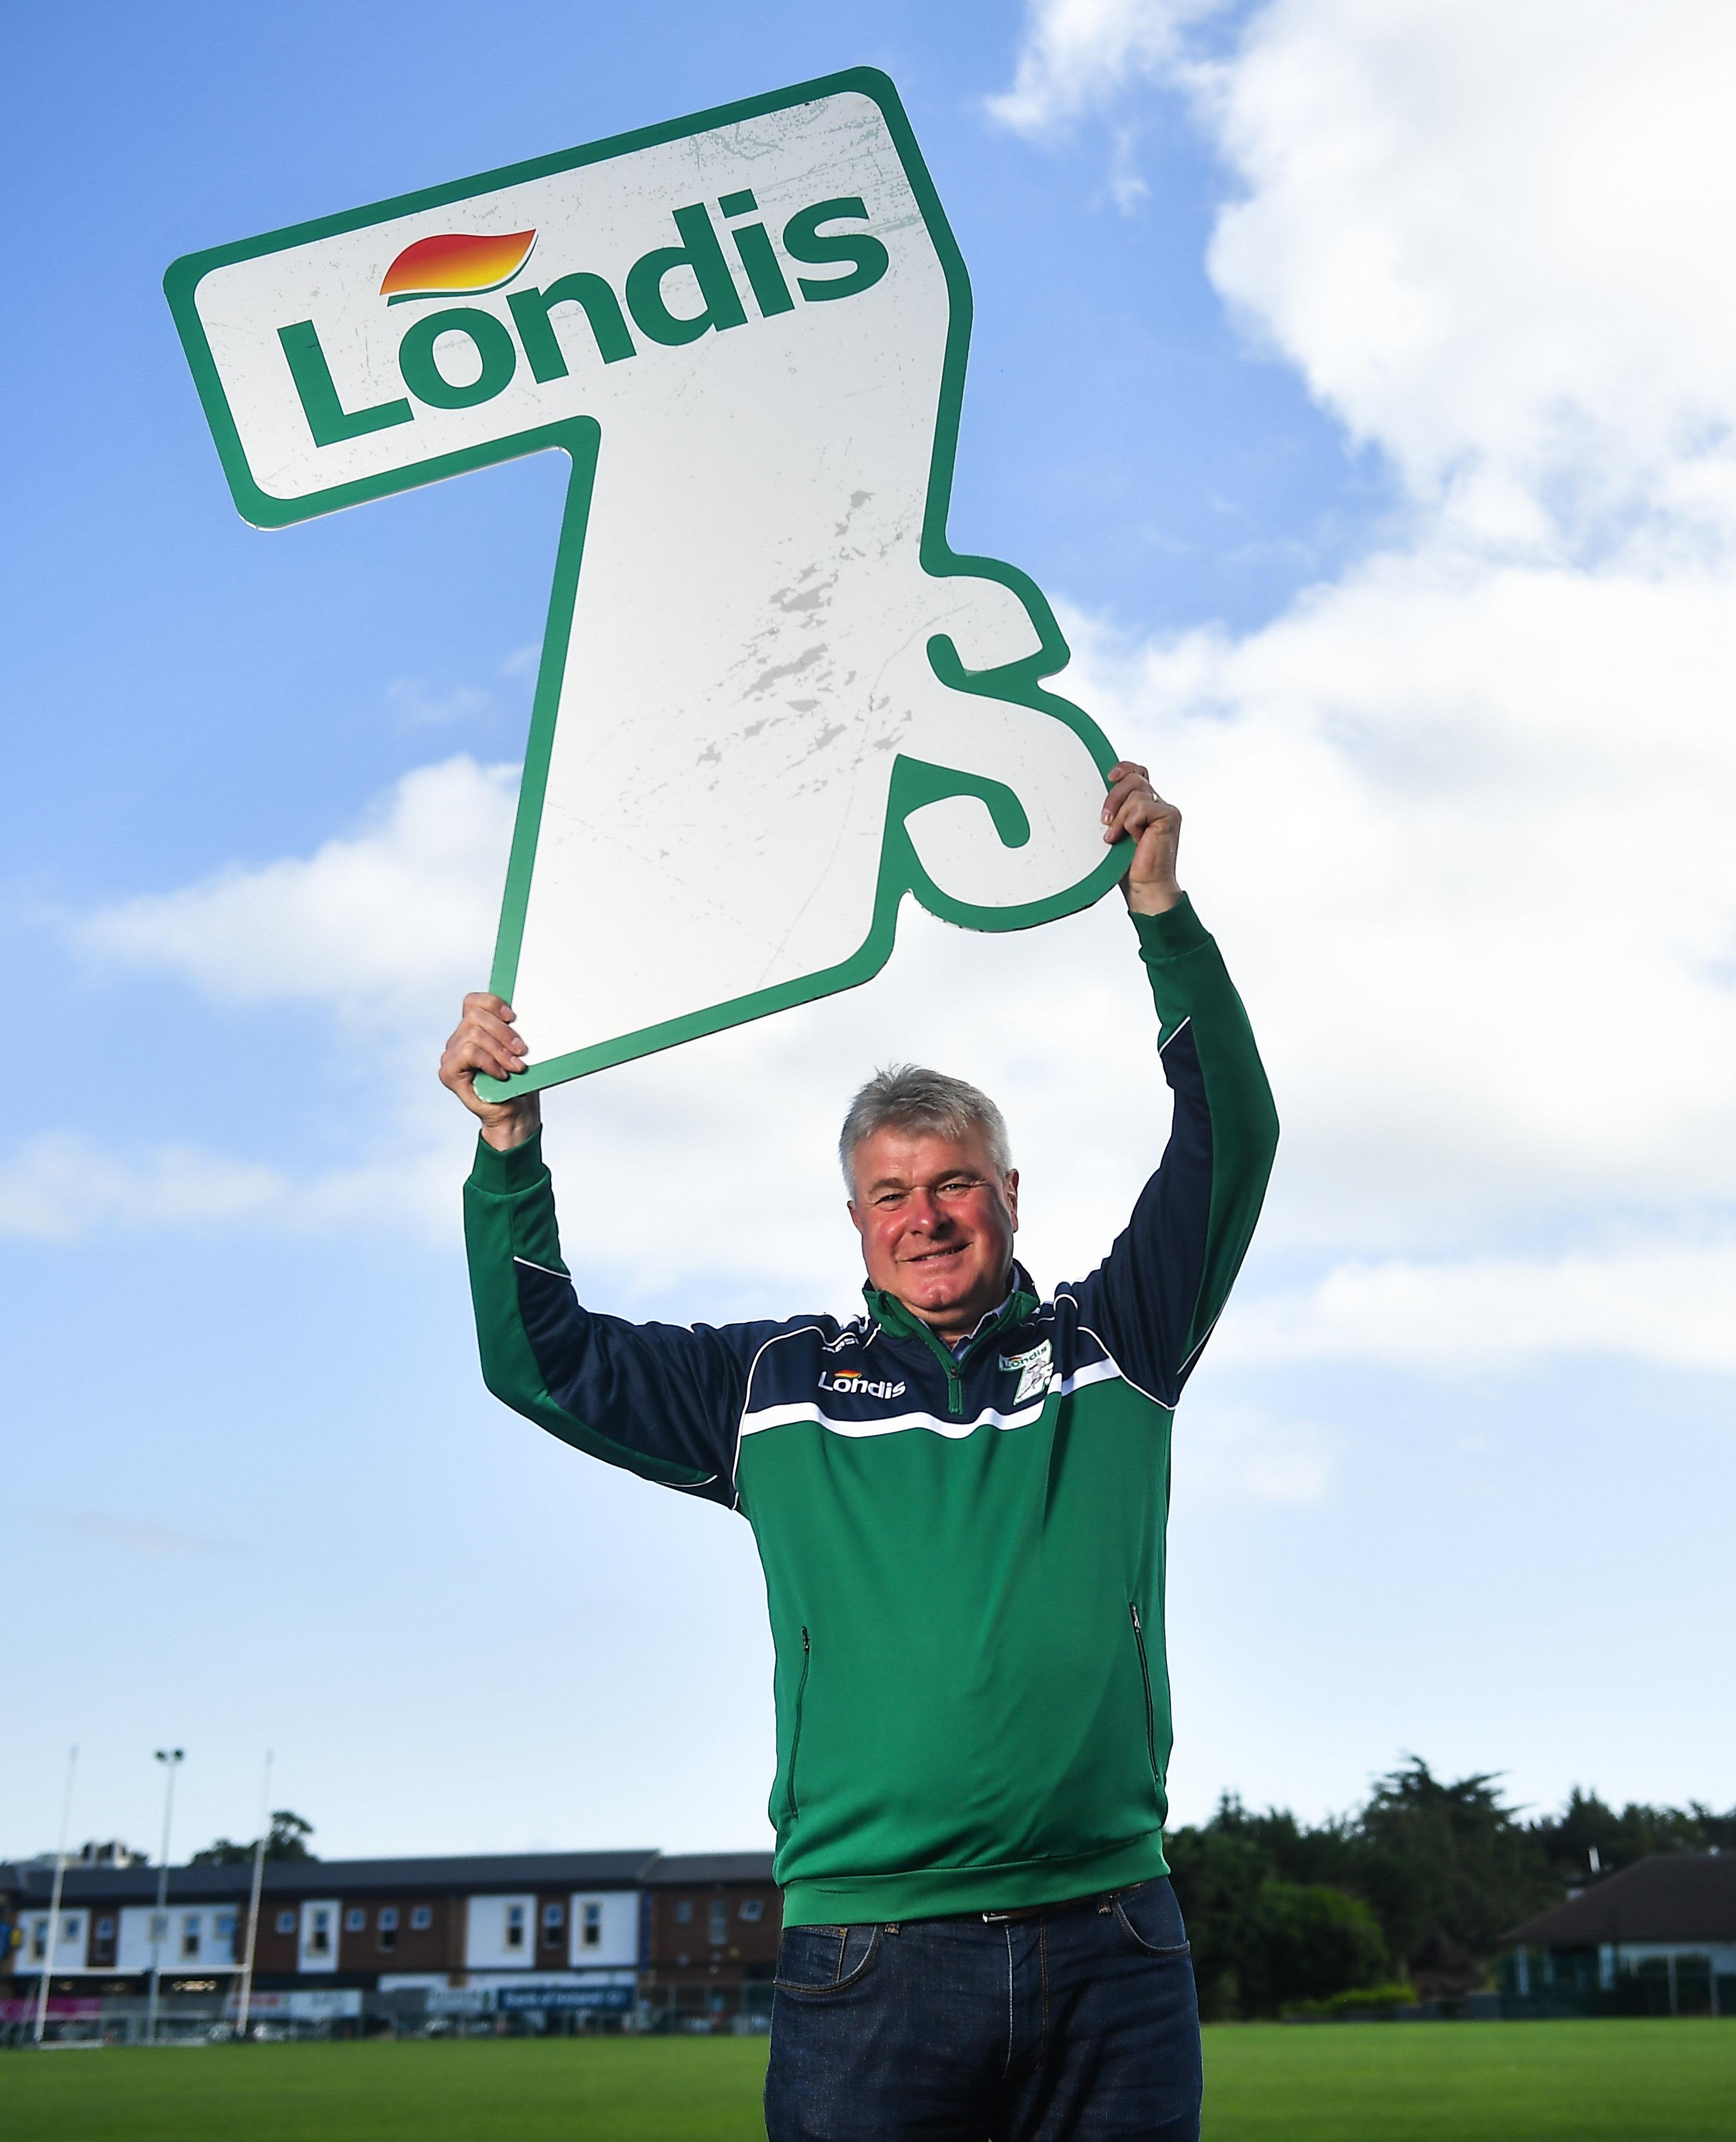 Robbie Moloney Brand Liaison Manager